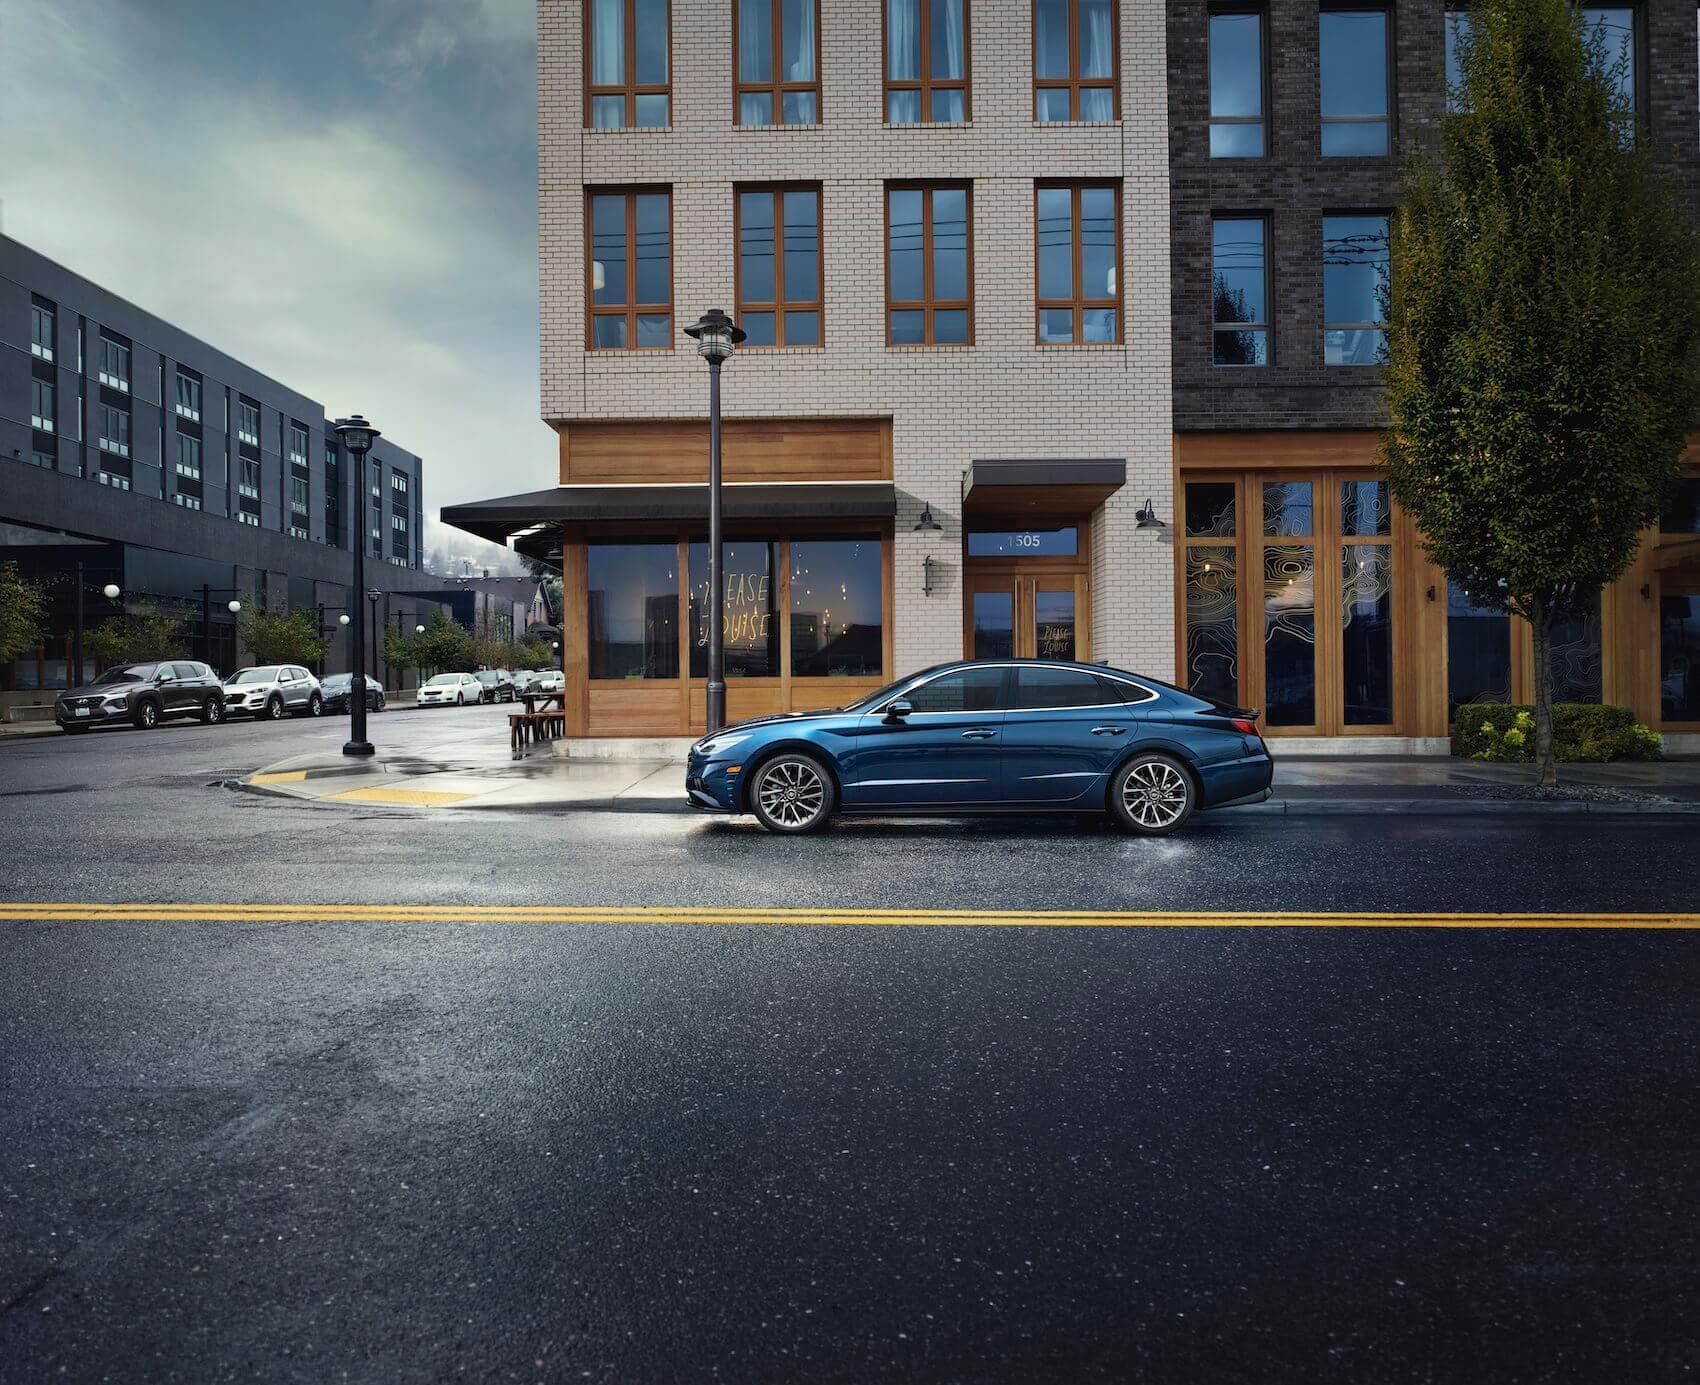 2021 Hyundai Sonata: Performance and Fuel Economy